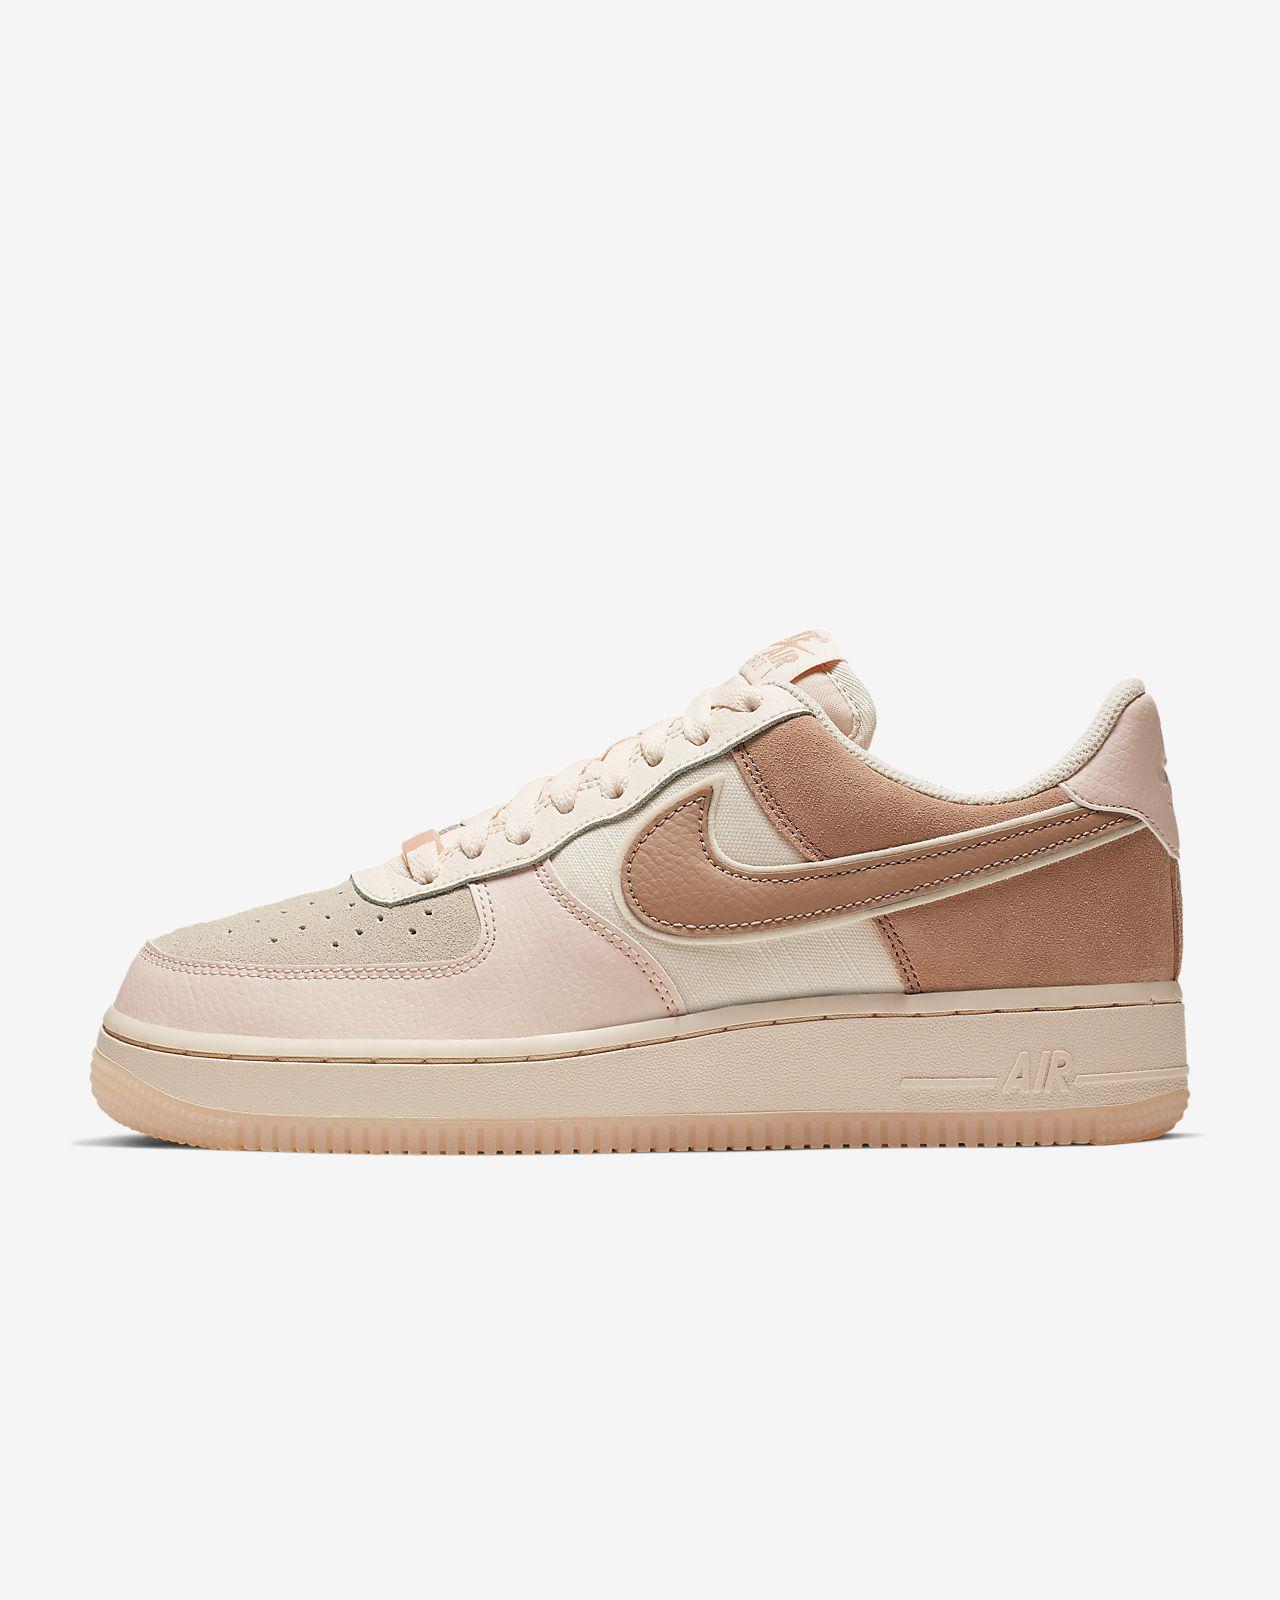 Nike Air Force 1 '07 Low Premium Women's Shoe